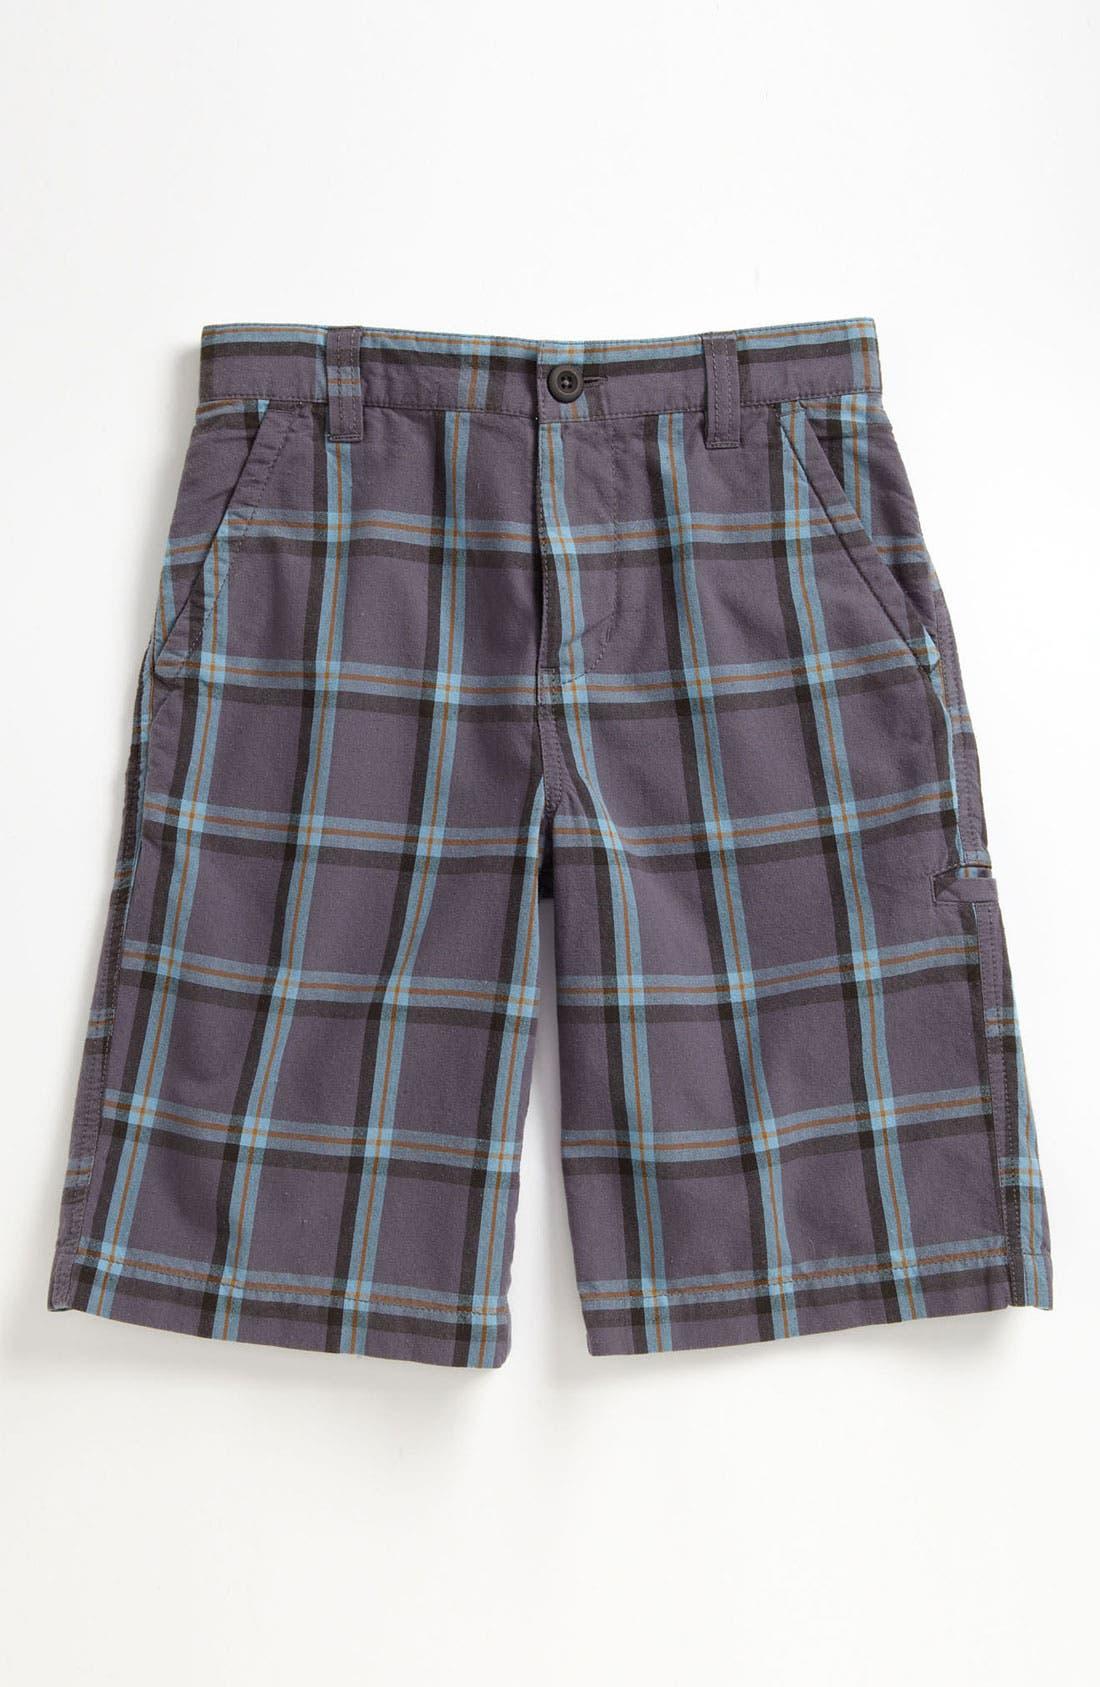 Alternate Image 1 Selected - Tucker + Tate 'Trevor' Plaid Shorts (Toddler)